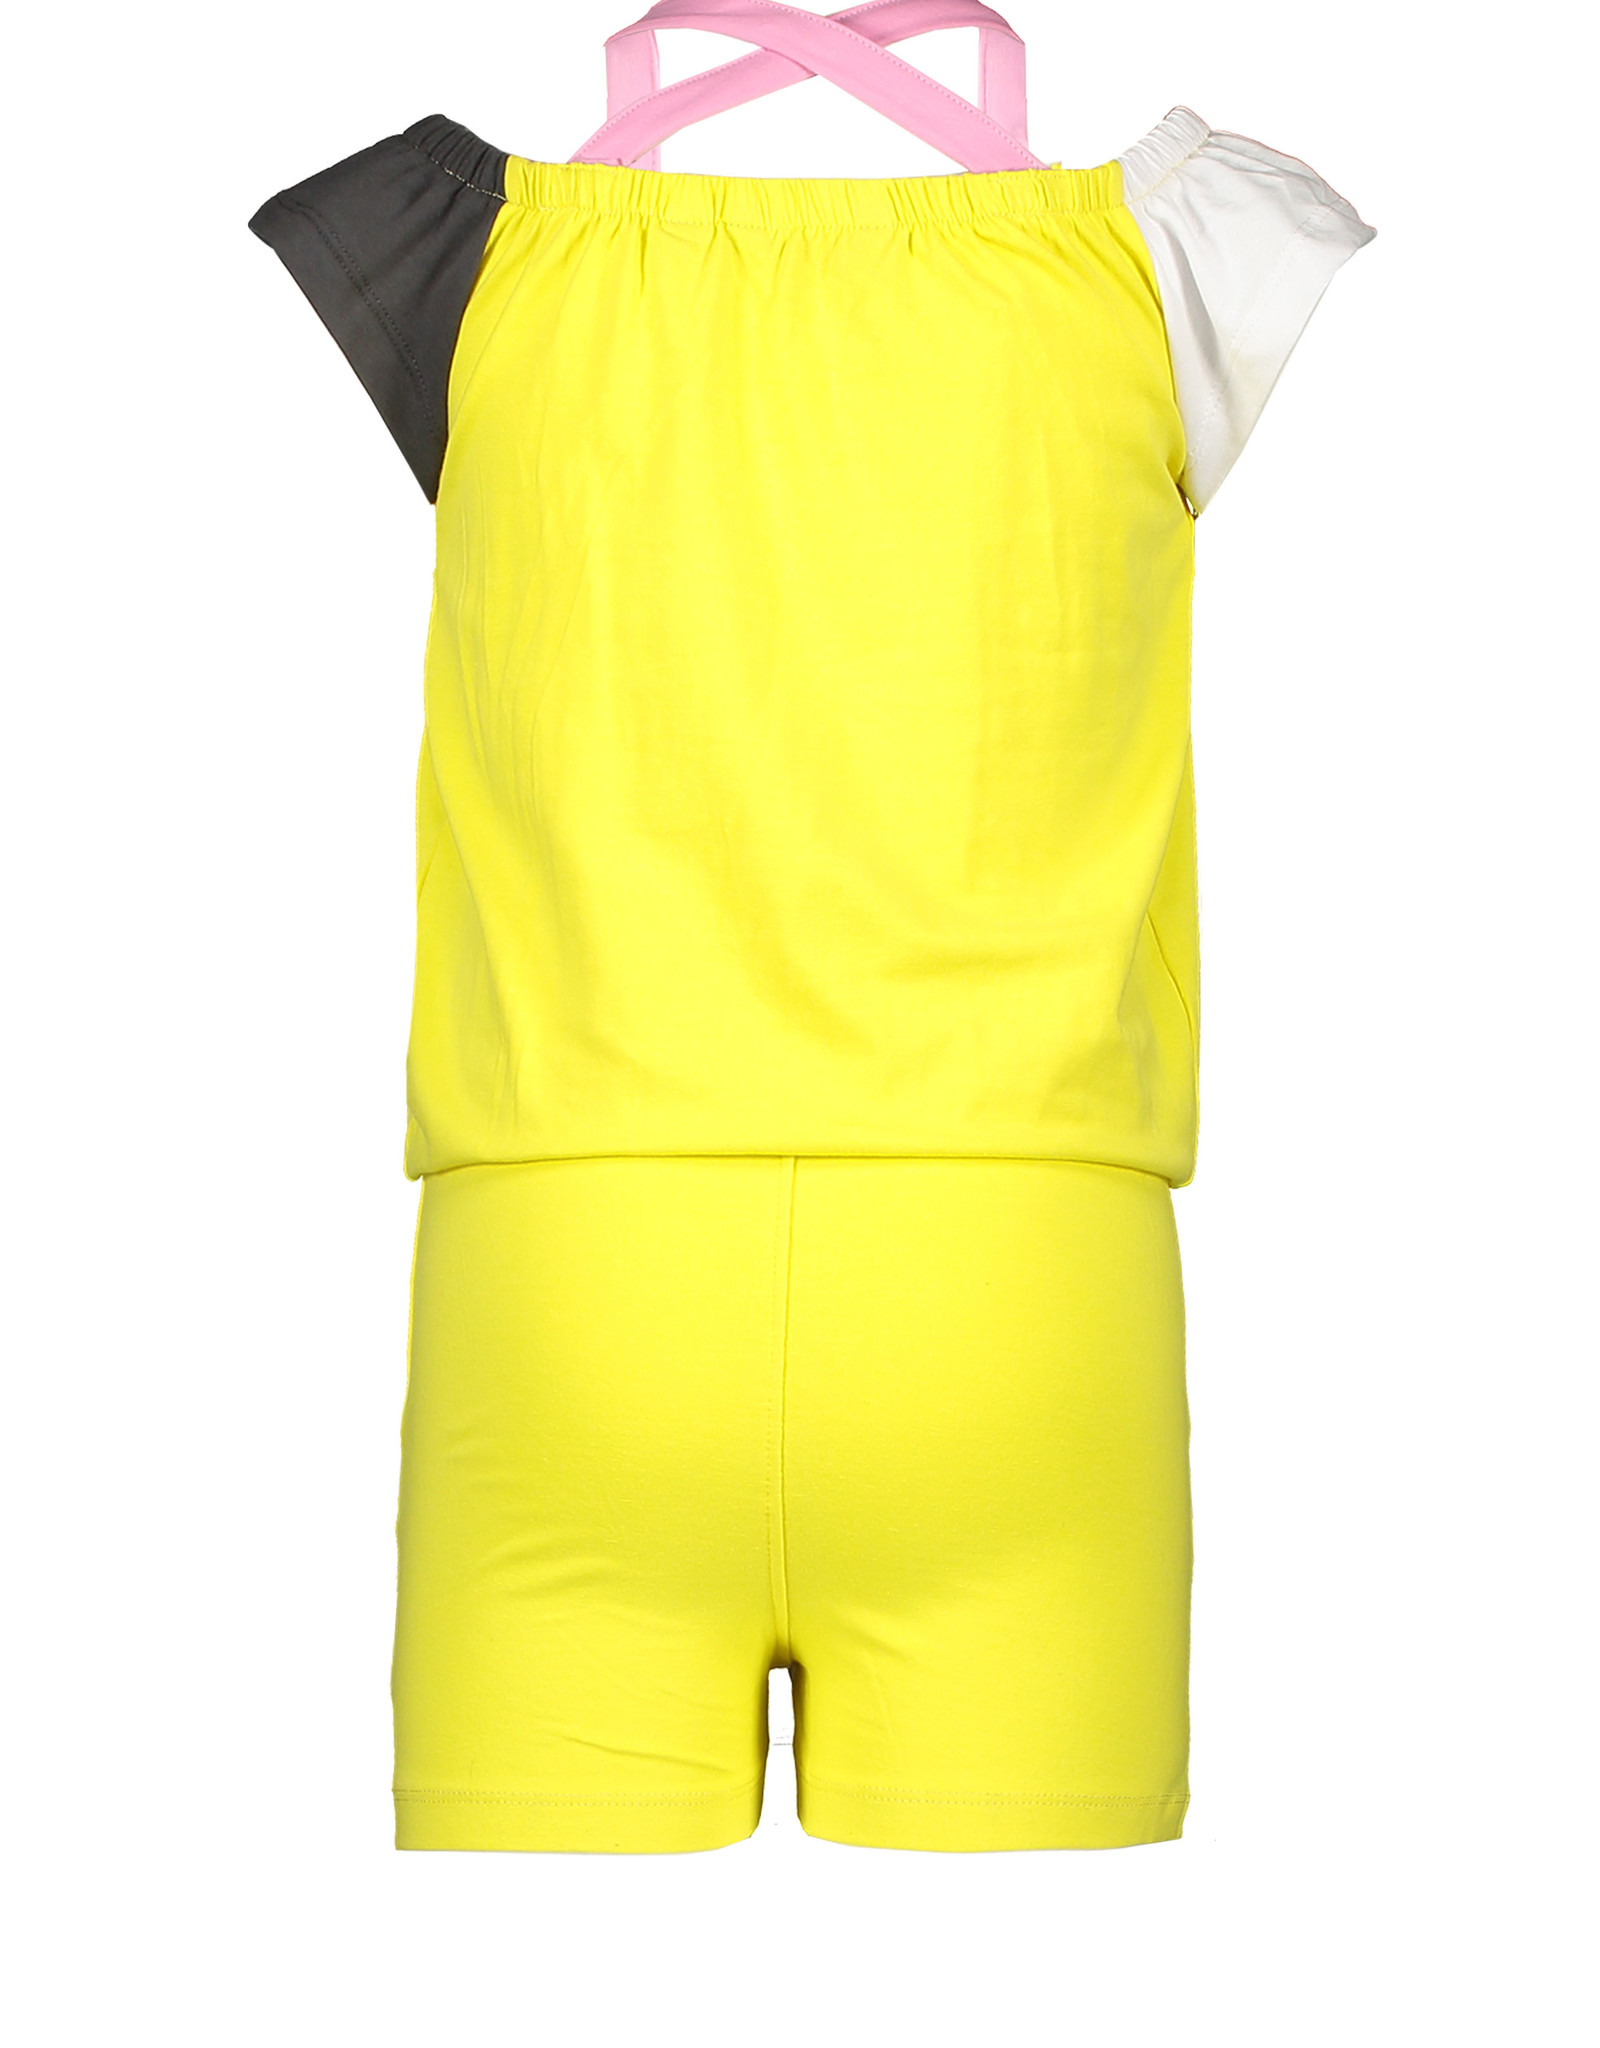 Moodstreet Moodstreet playsuit 5610 yellow